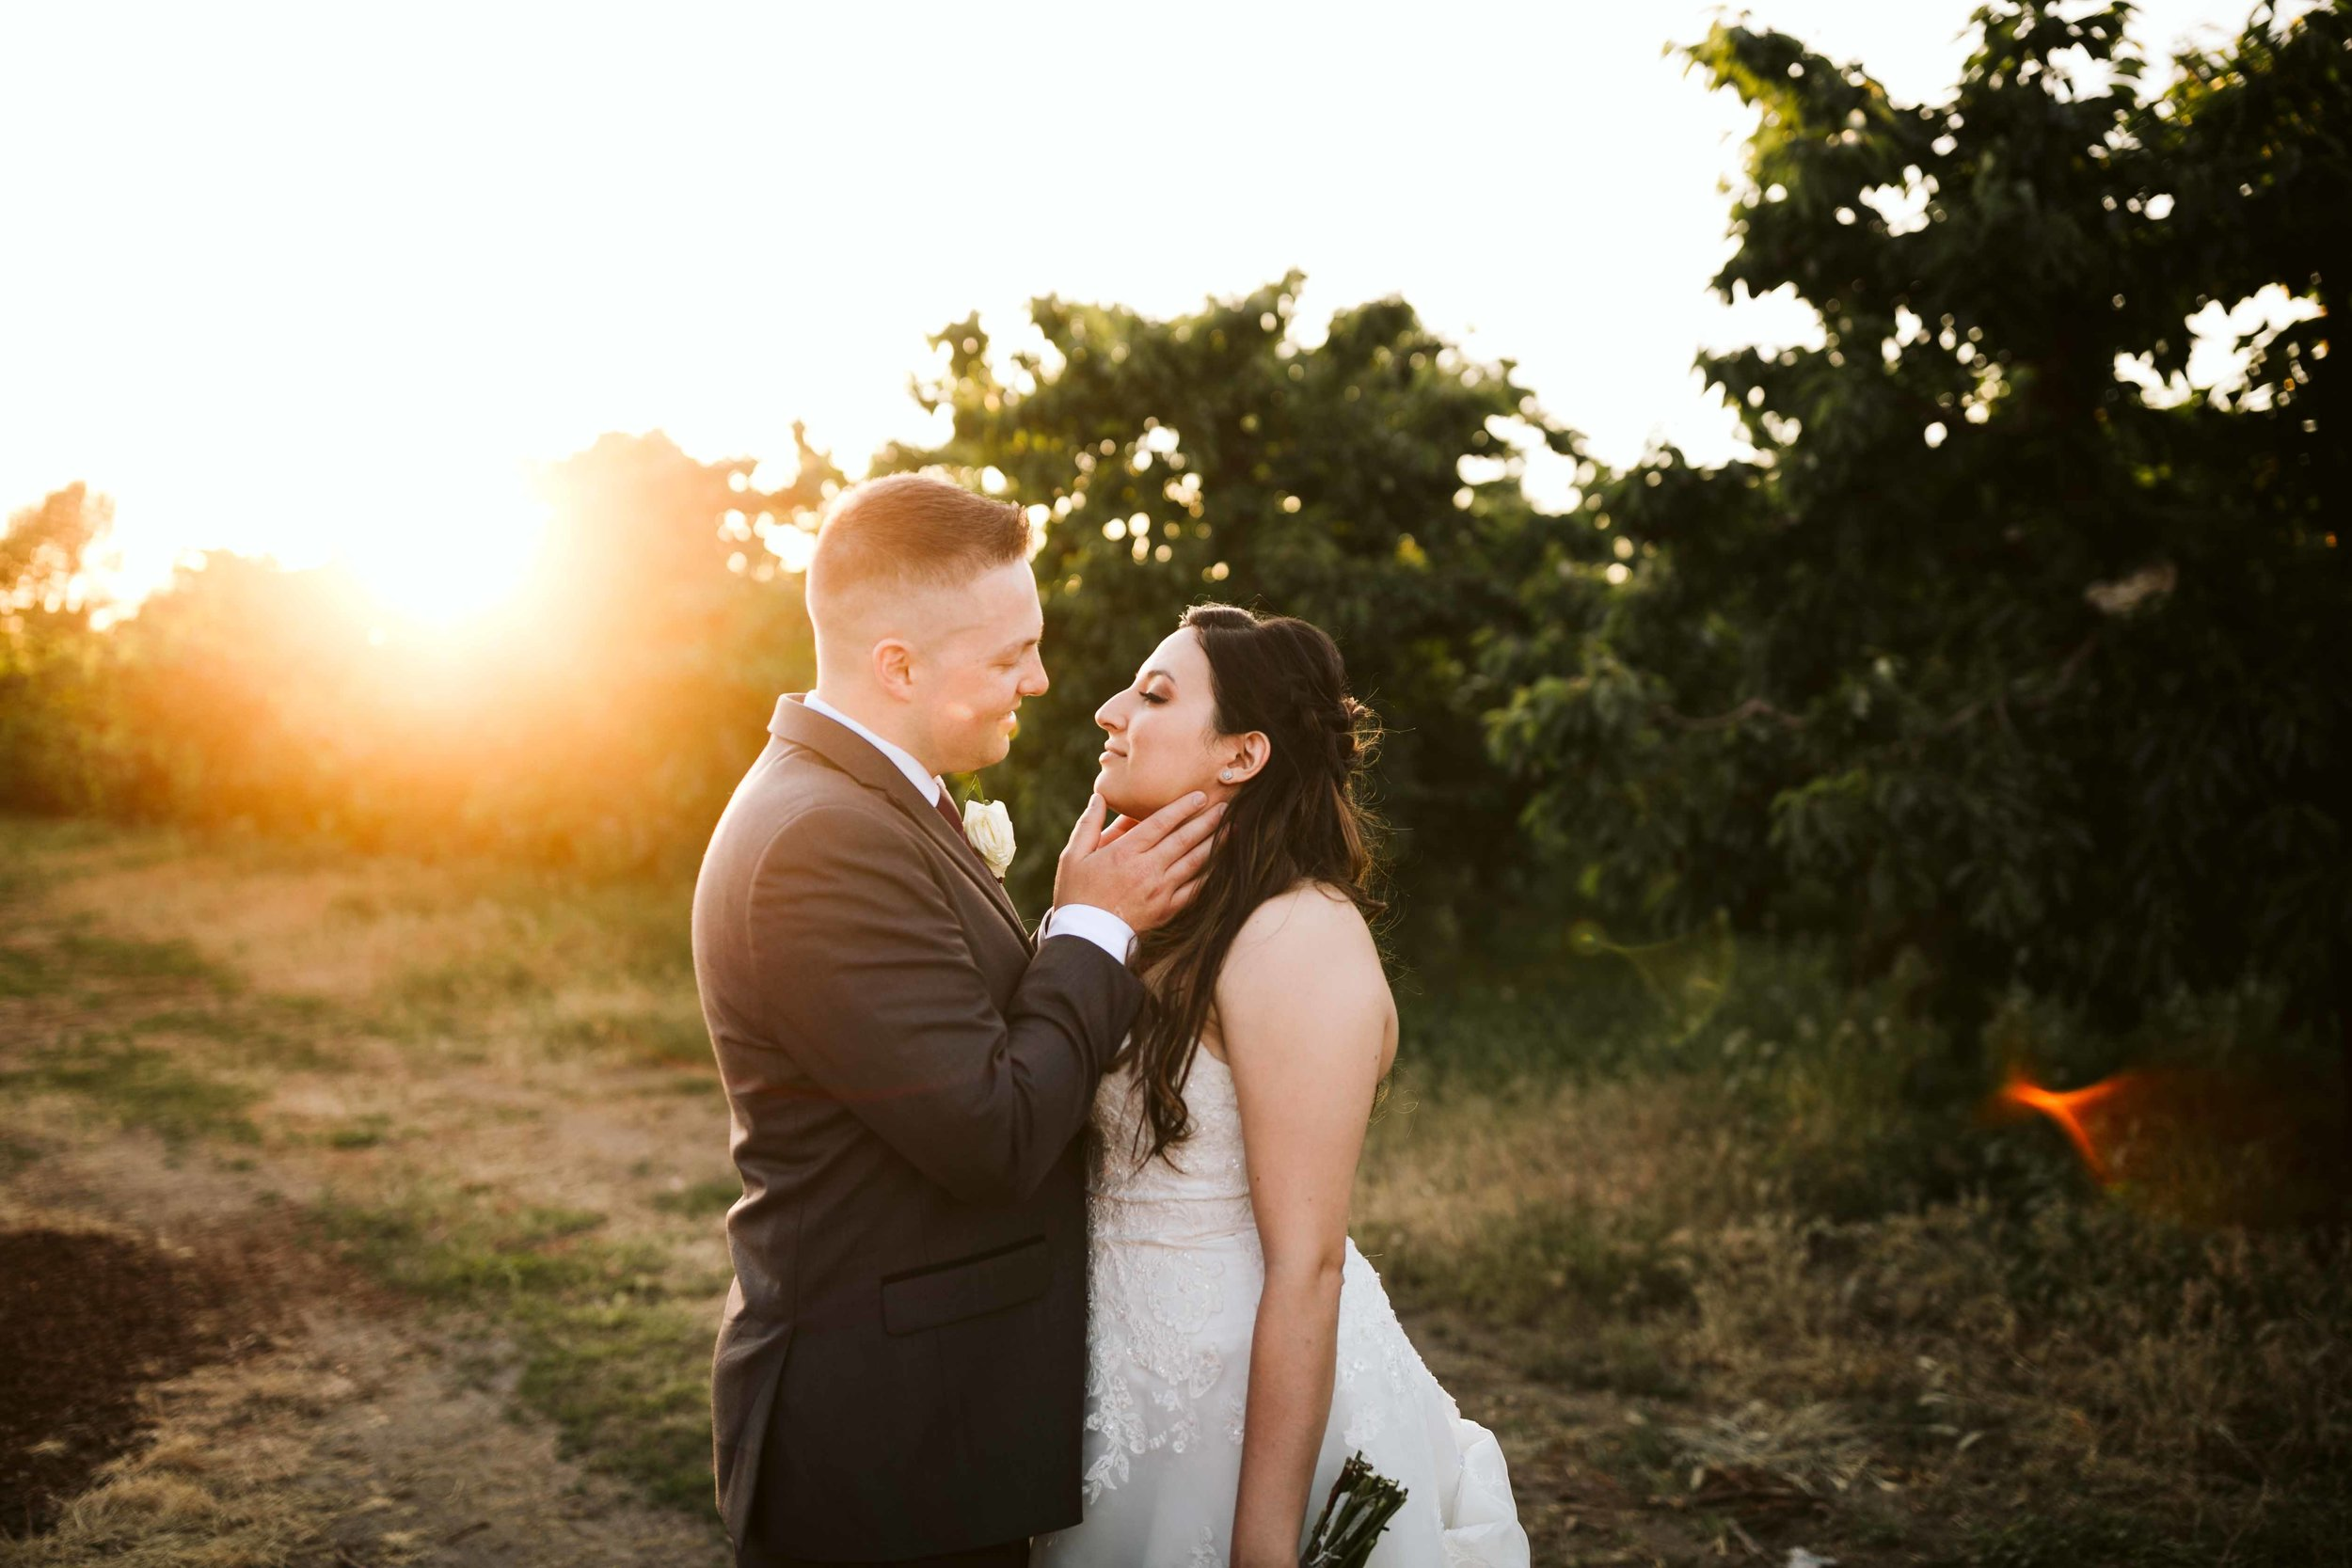 tuncannon-cellars-wedding-126.jpg